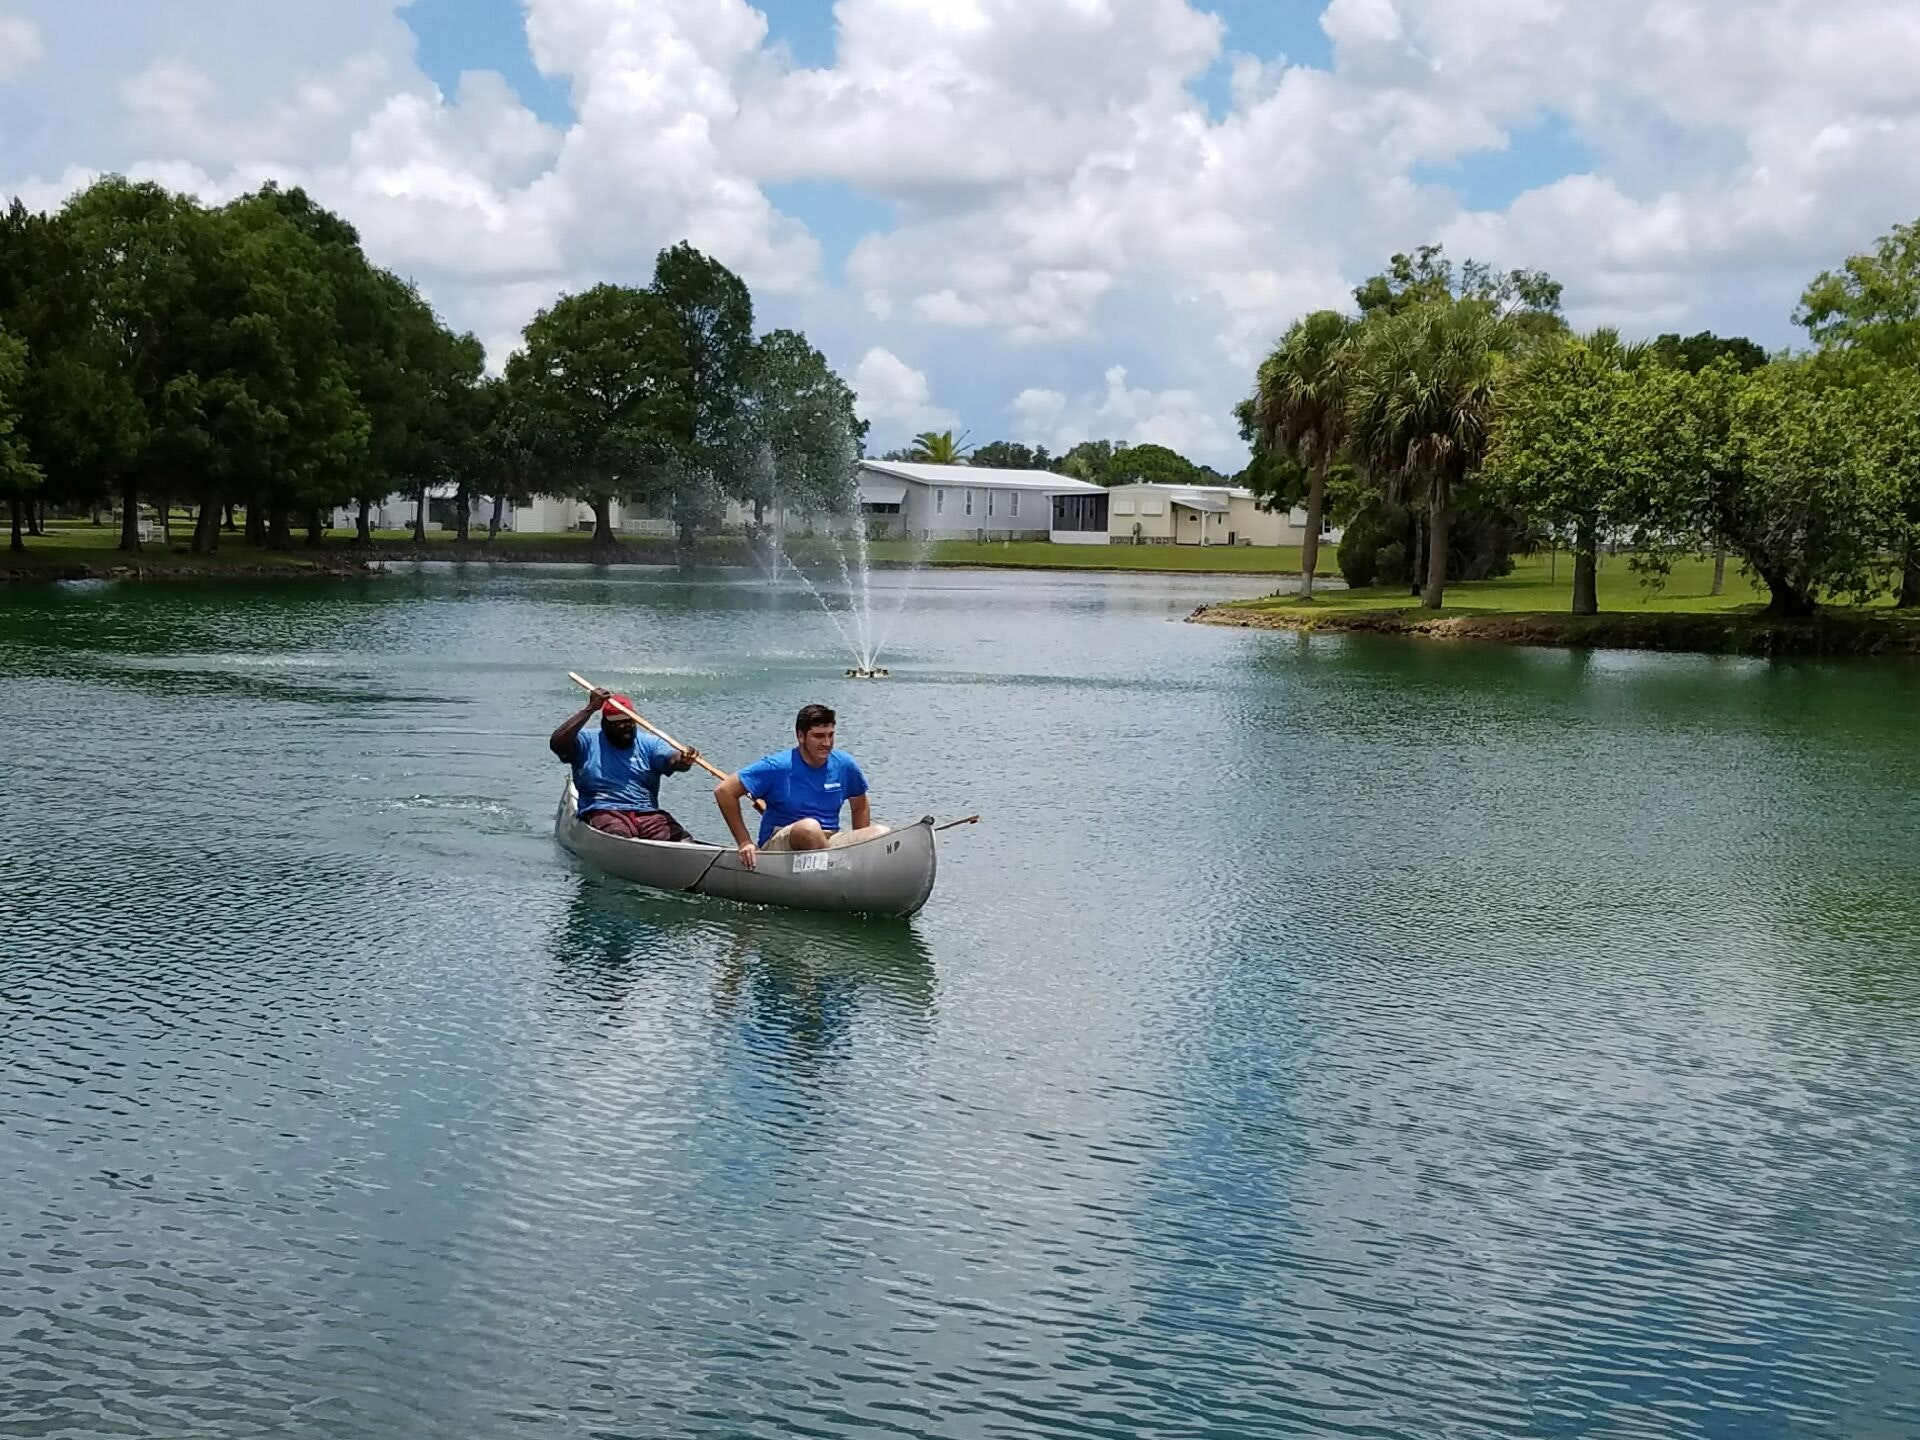 May contain: person, human, vehicle, transportation, boat, rowboat, and water